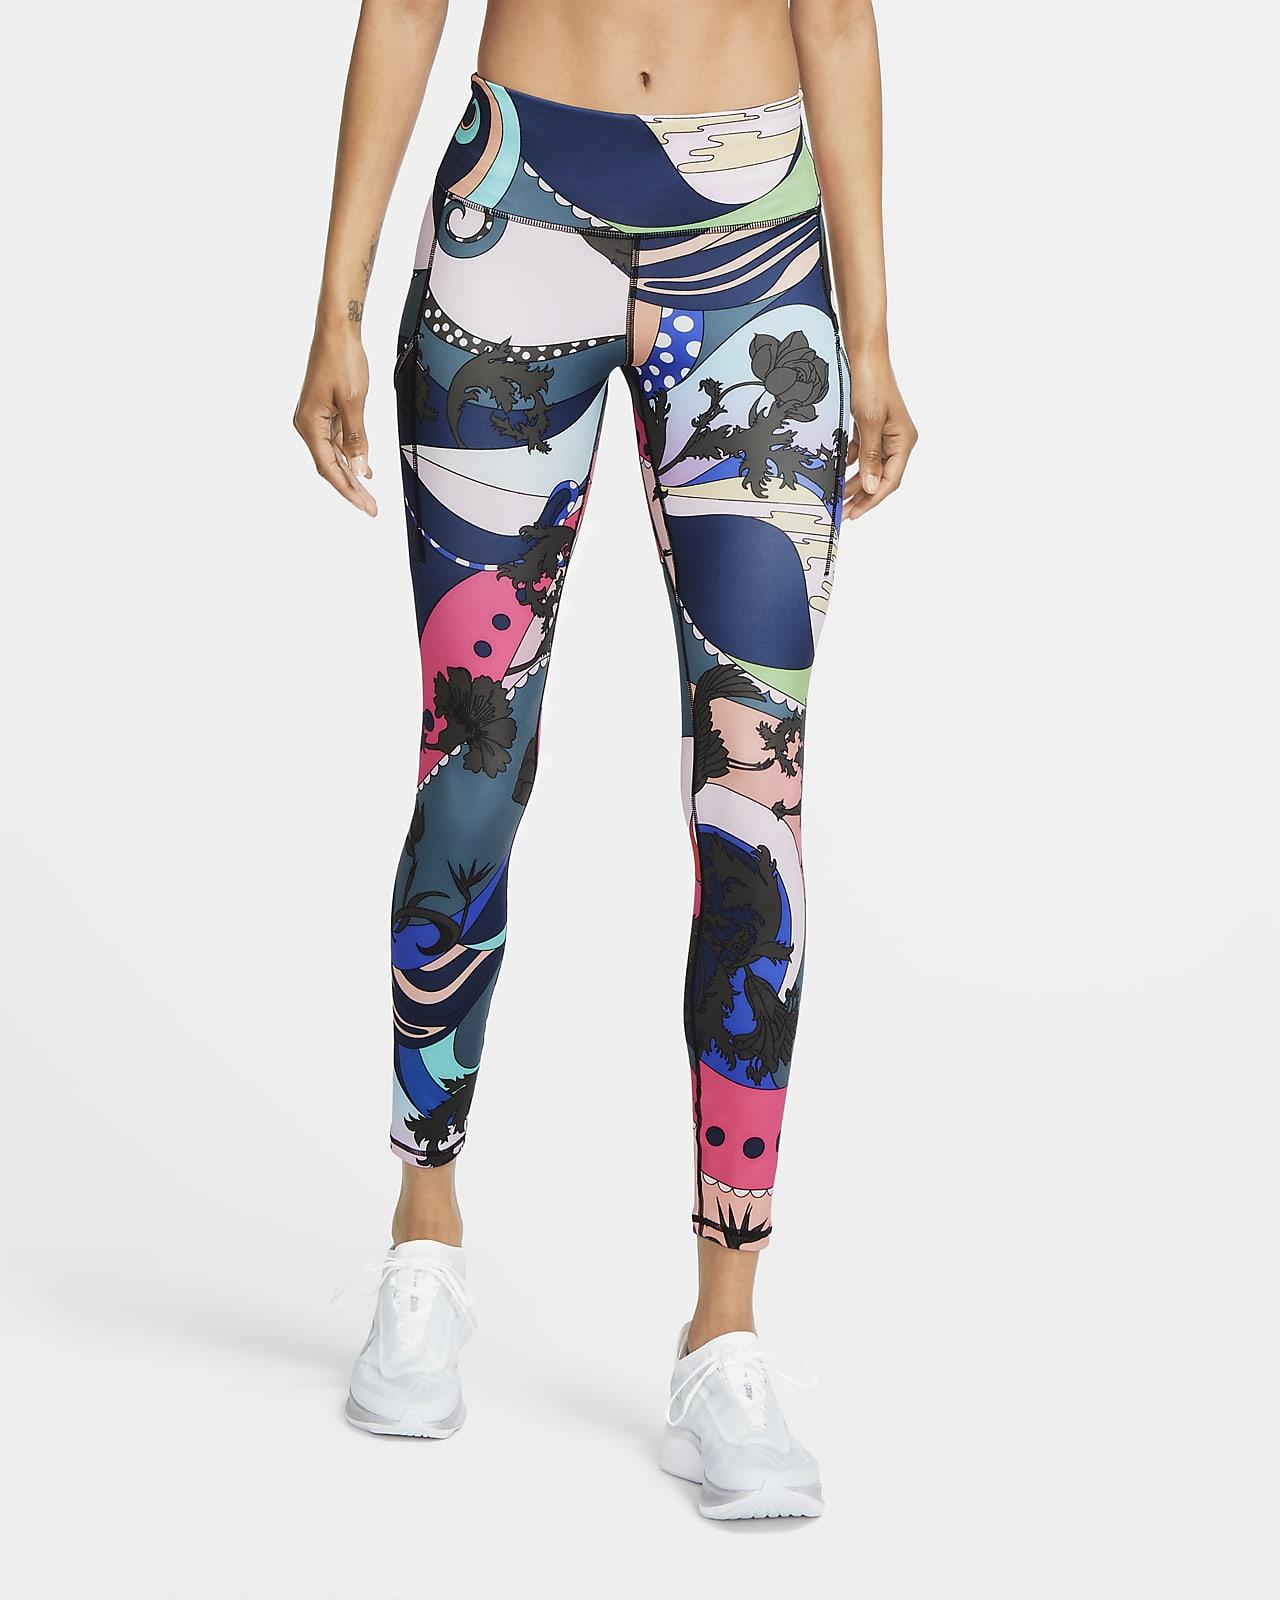 Nike Epic Luxe Icon Clash Women's Printed Running Leggings